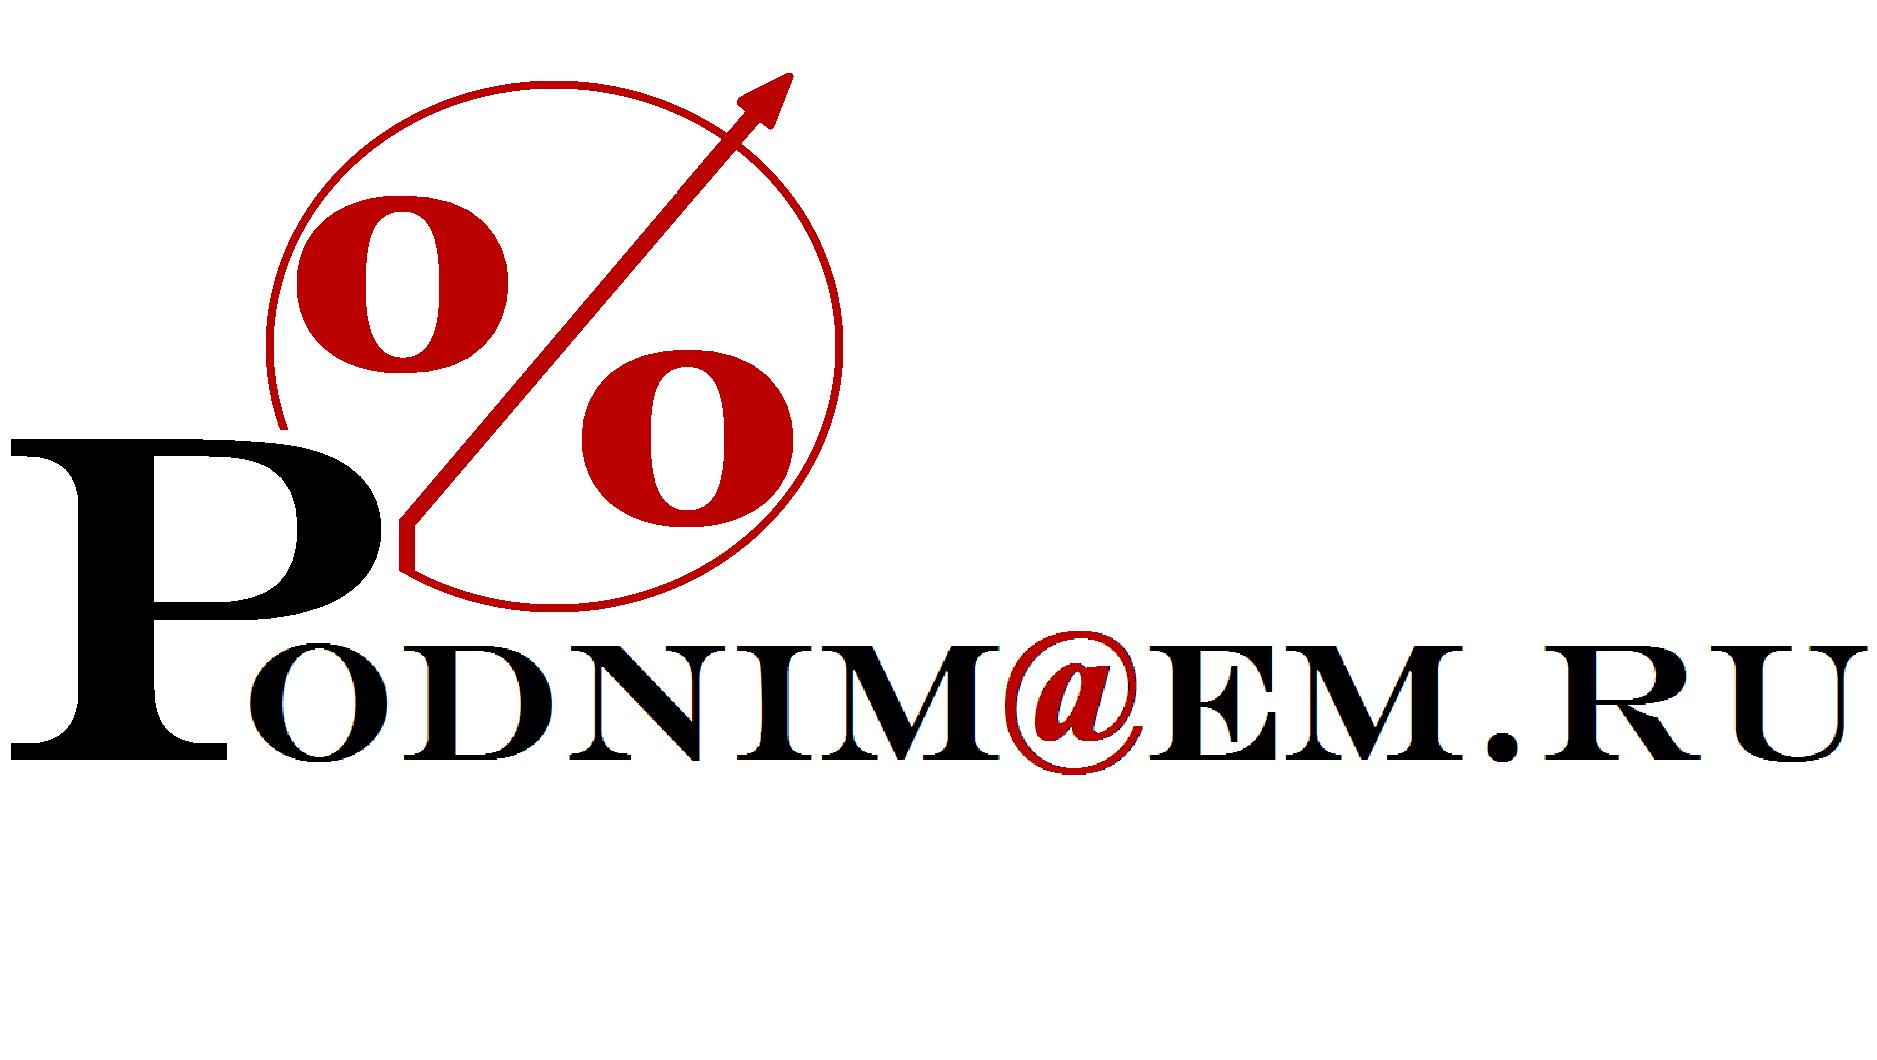 Разработать логотип + визитку + логотип для печати ООО +++ фото f_346554774ea58745.png